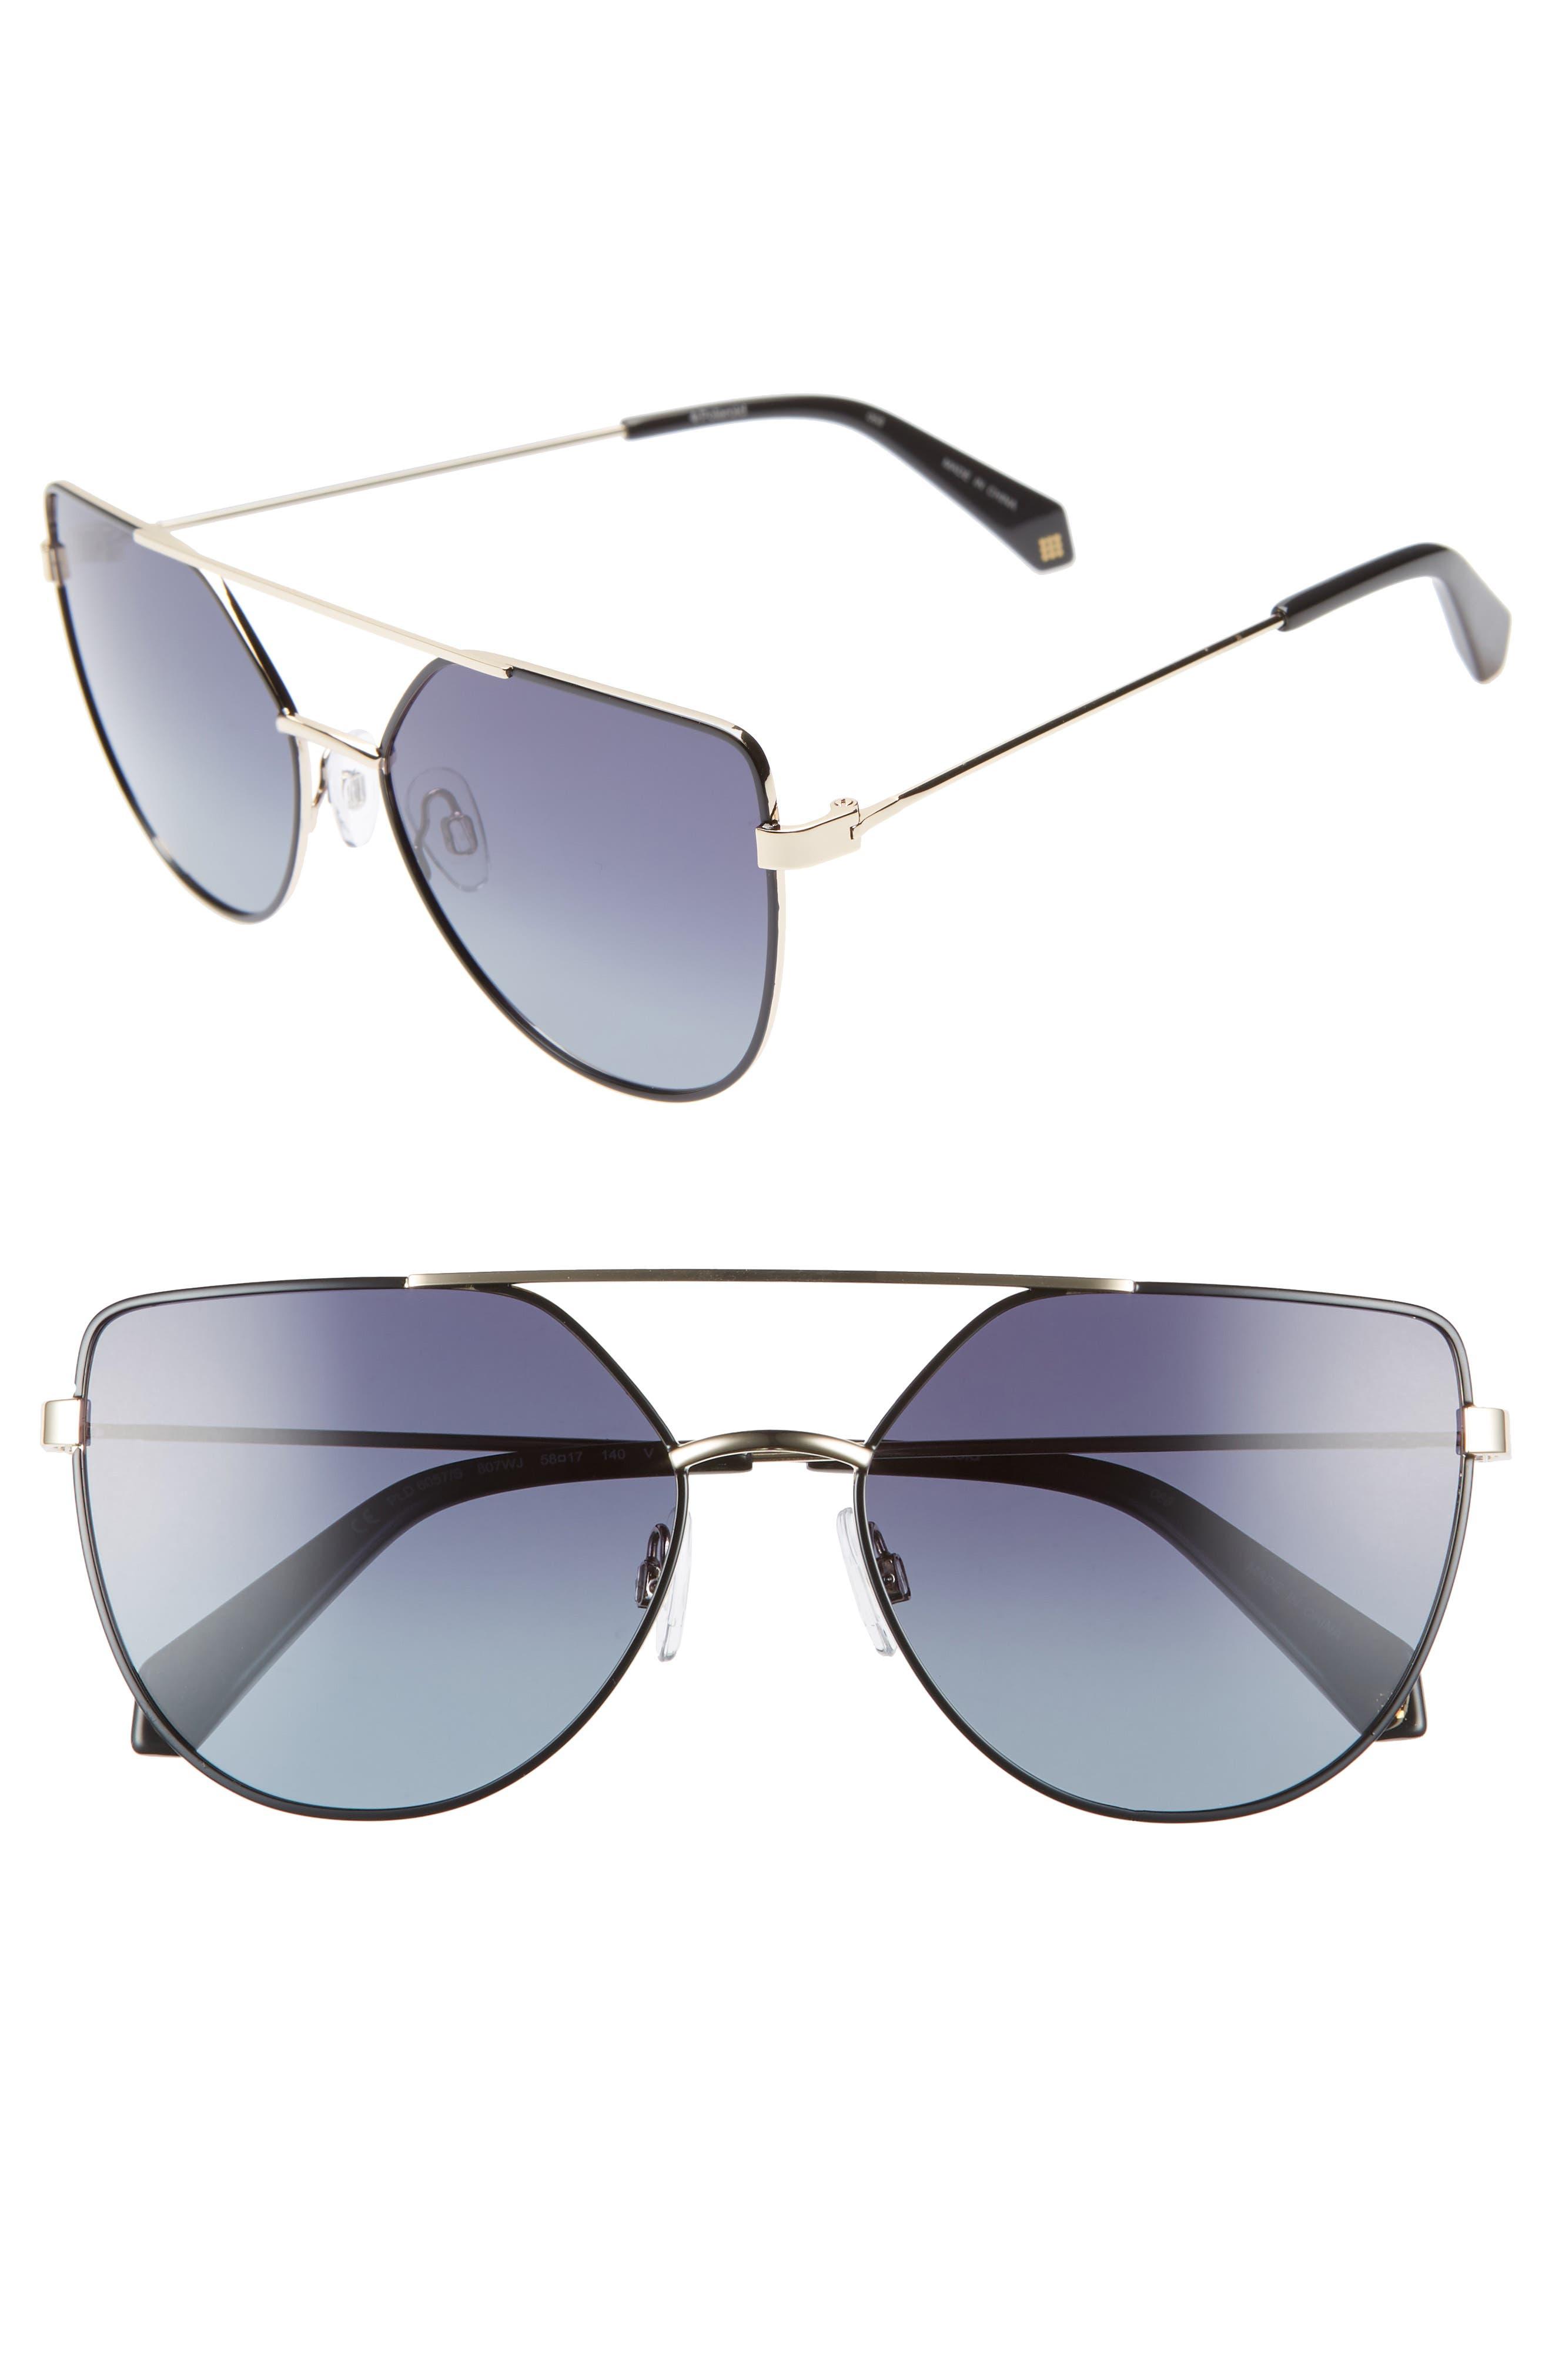 POLAROID 58Mm Polarized Sunglasses - Black